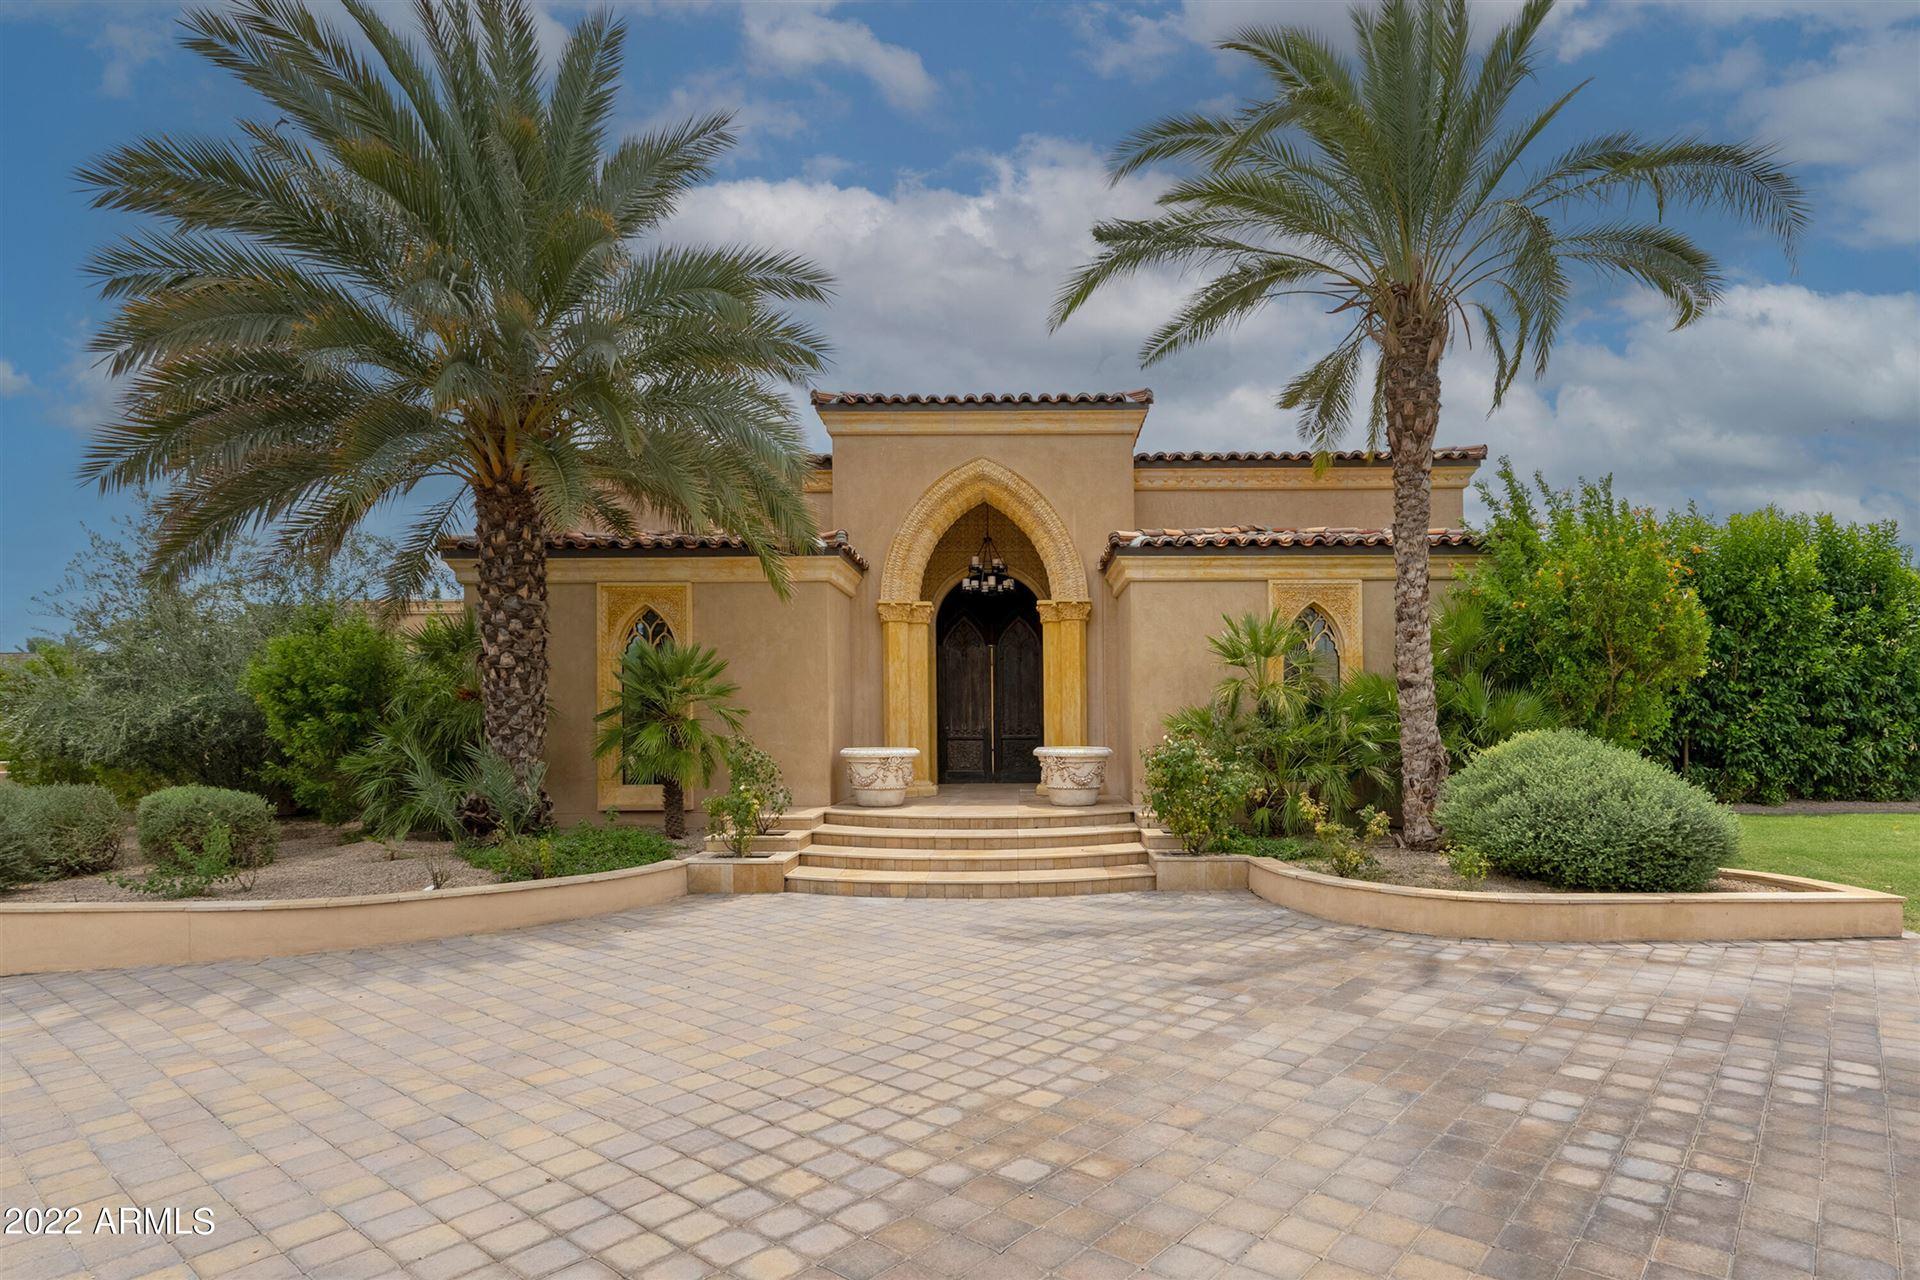 Photo of 6659 E Indian Bend Road, Paradise Valley, AZ 85253 (MLS # 6174692)